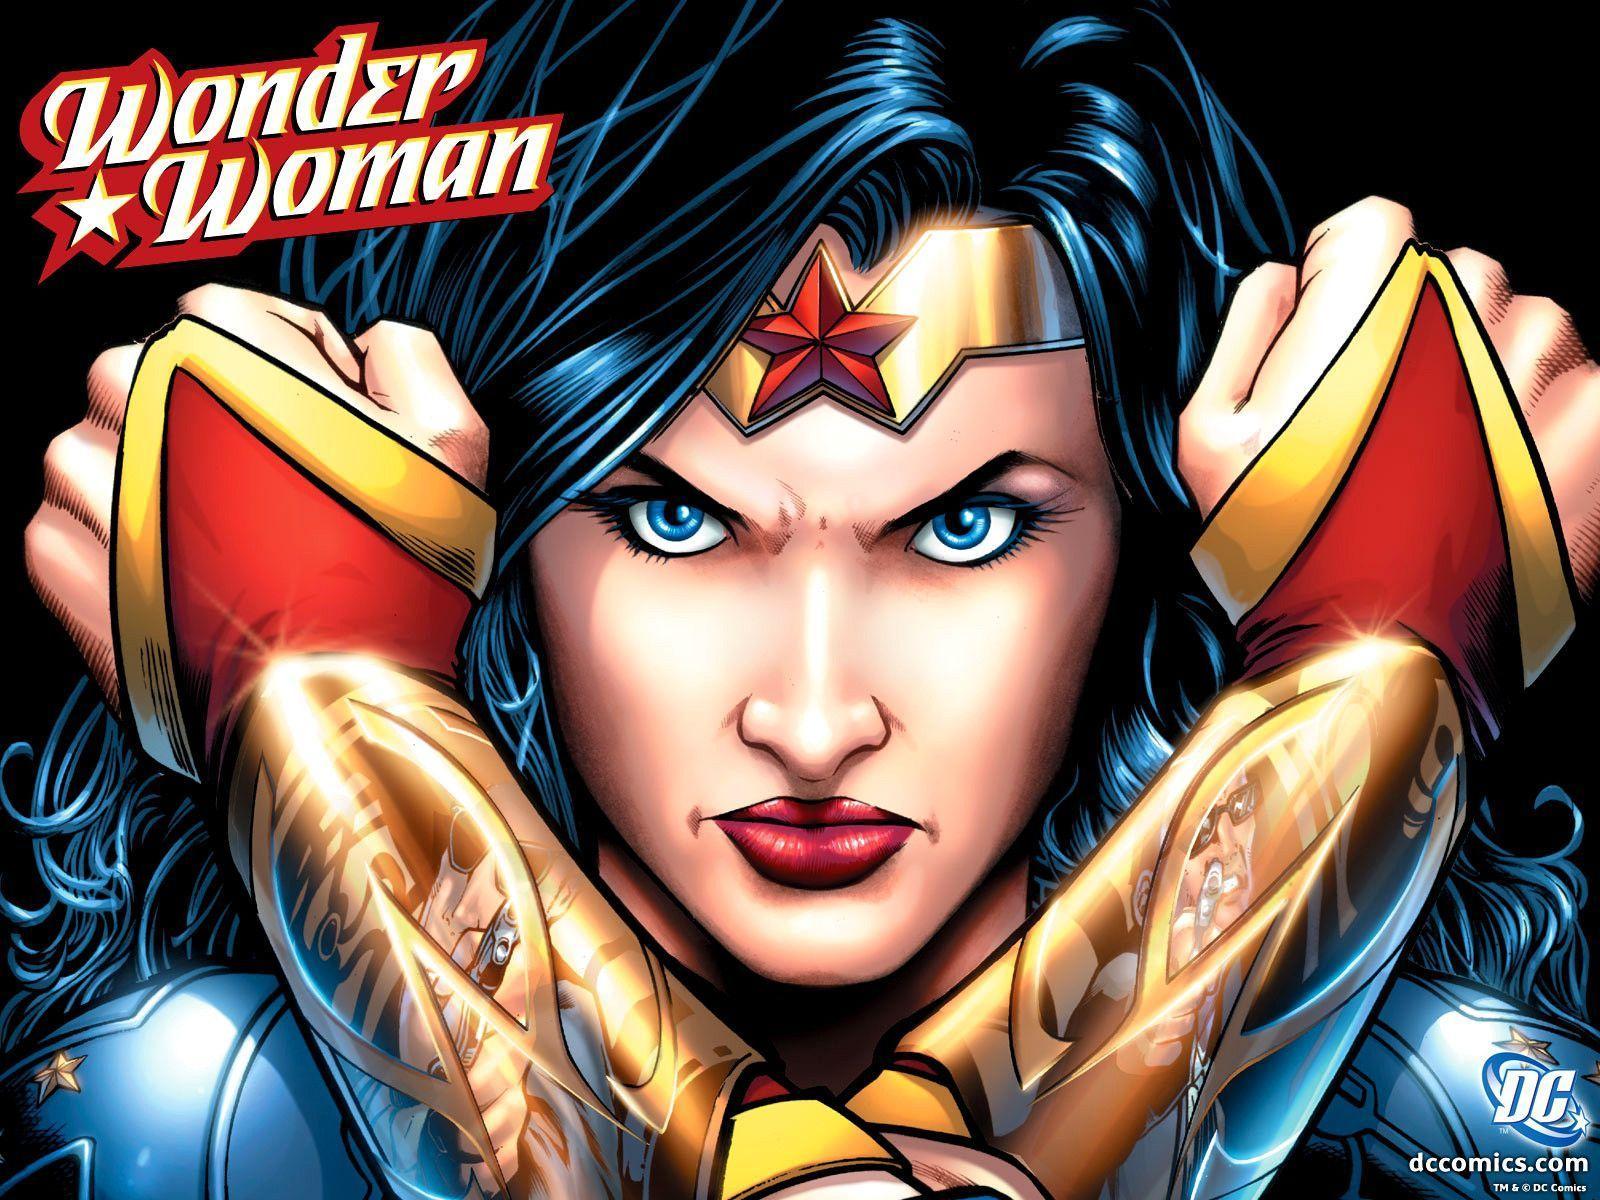 Hd wallpaper wonder woman - Wonder Woman Wallpaper Hd Large Hd Wallpaper Database